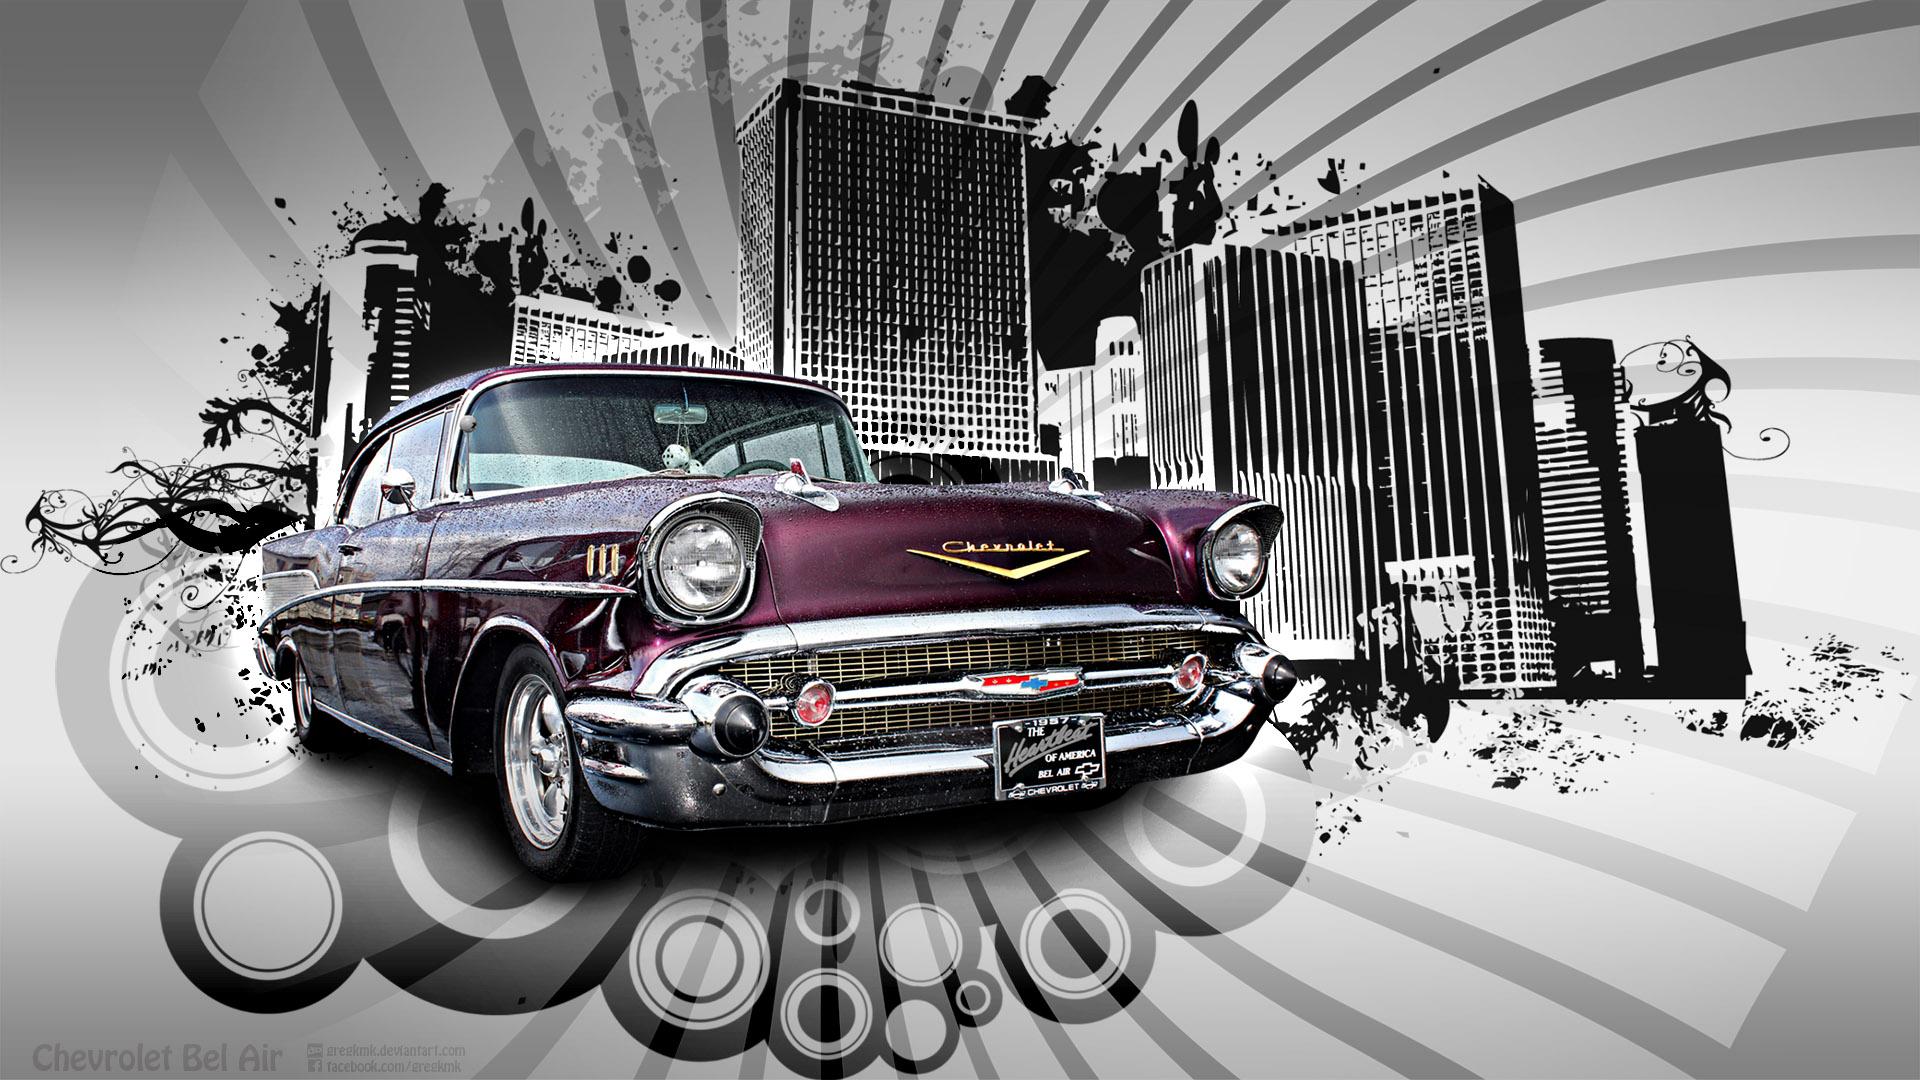 Chevrolet Bel Air Wallpaper 2 by GregKmk on DeviantArt